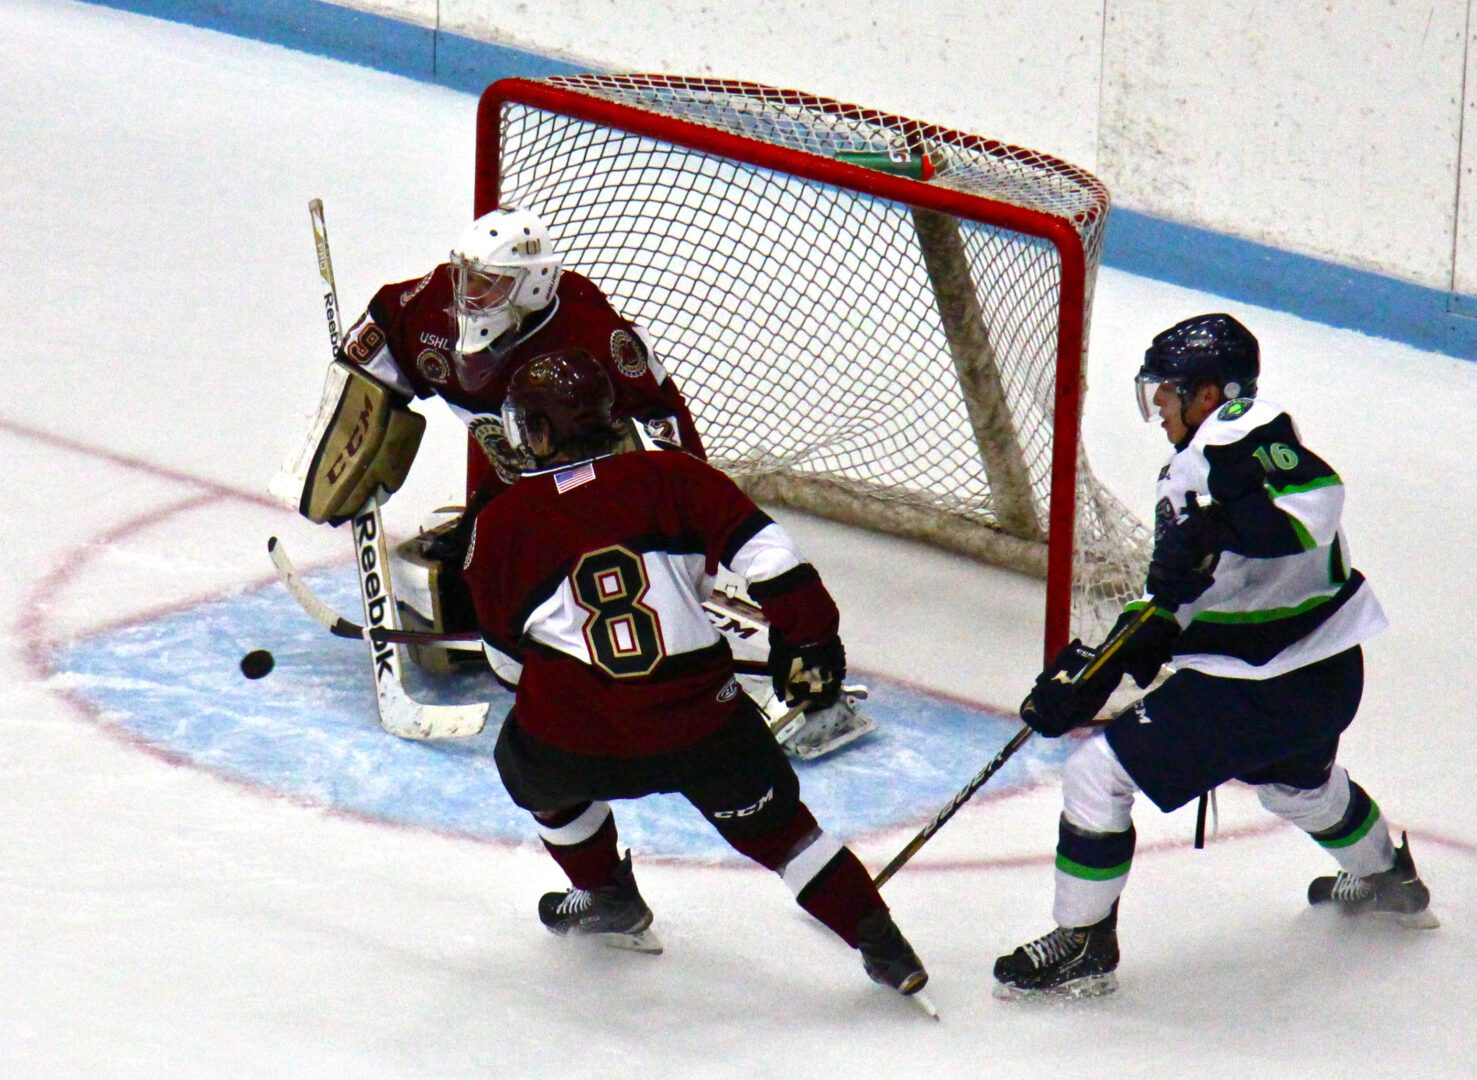 Lumberjacks top Fargo 3-2 in USHL Fall Classic West opener